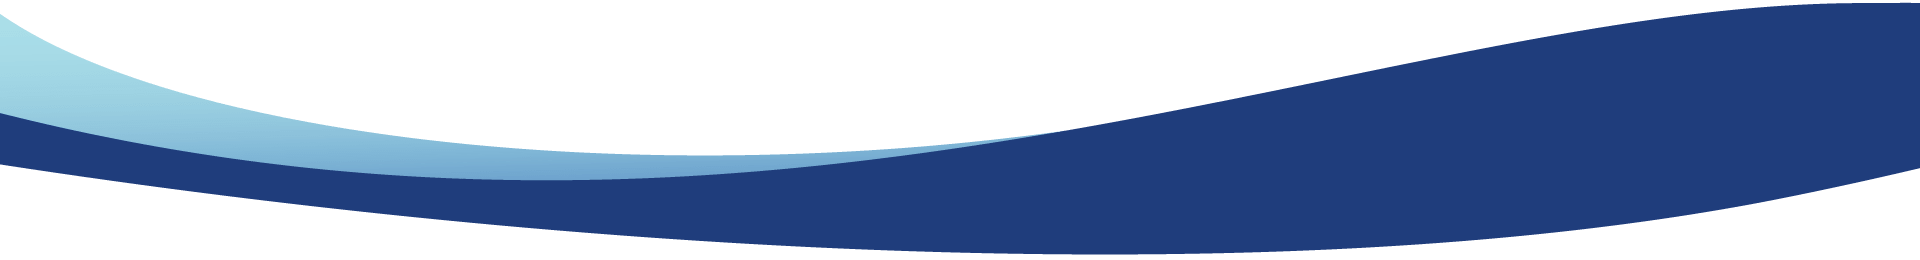 wave design 3